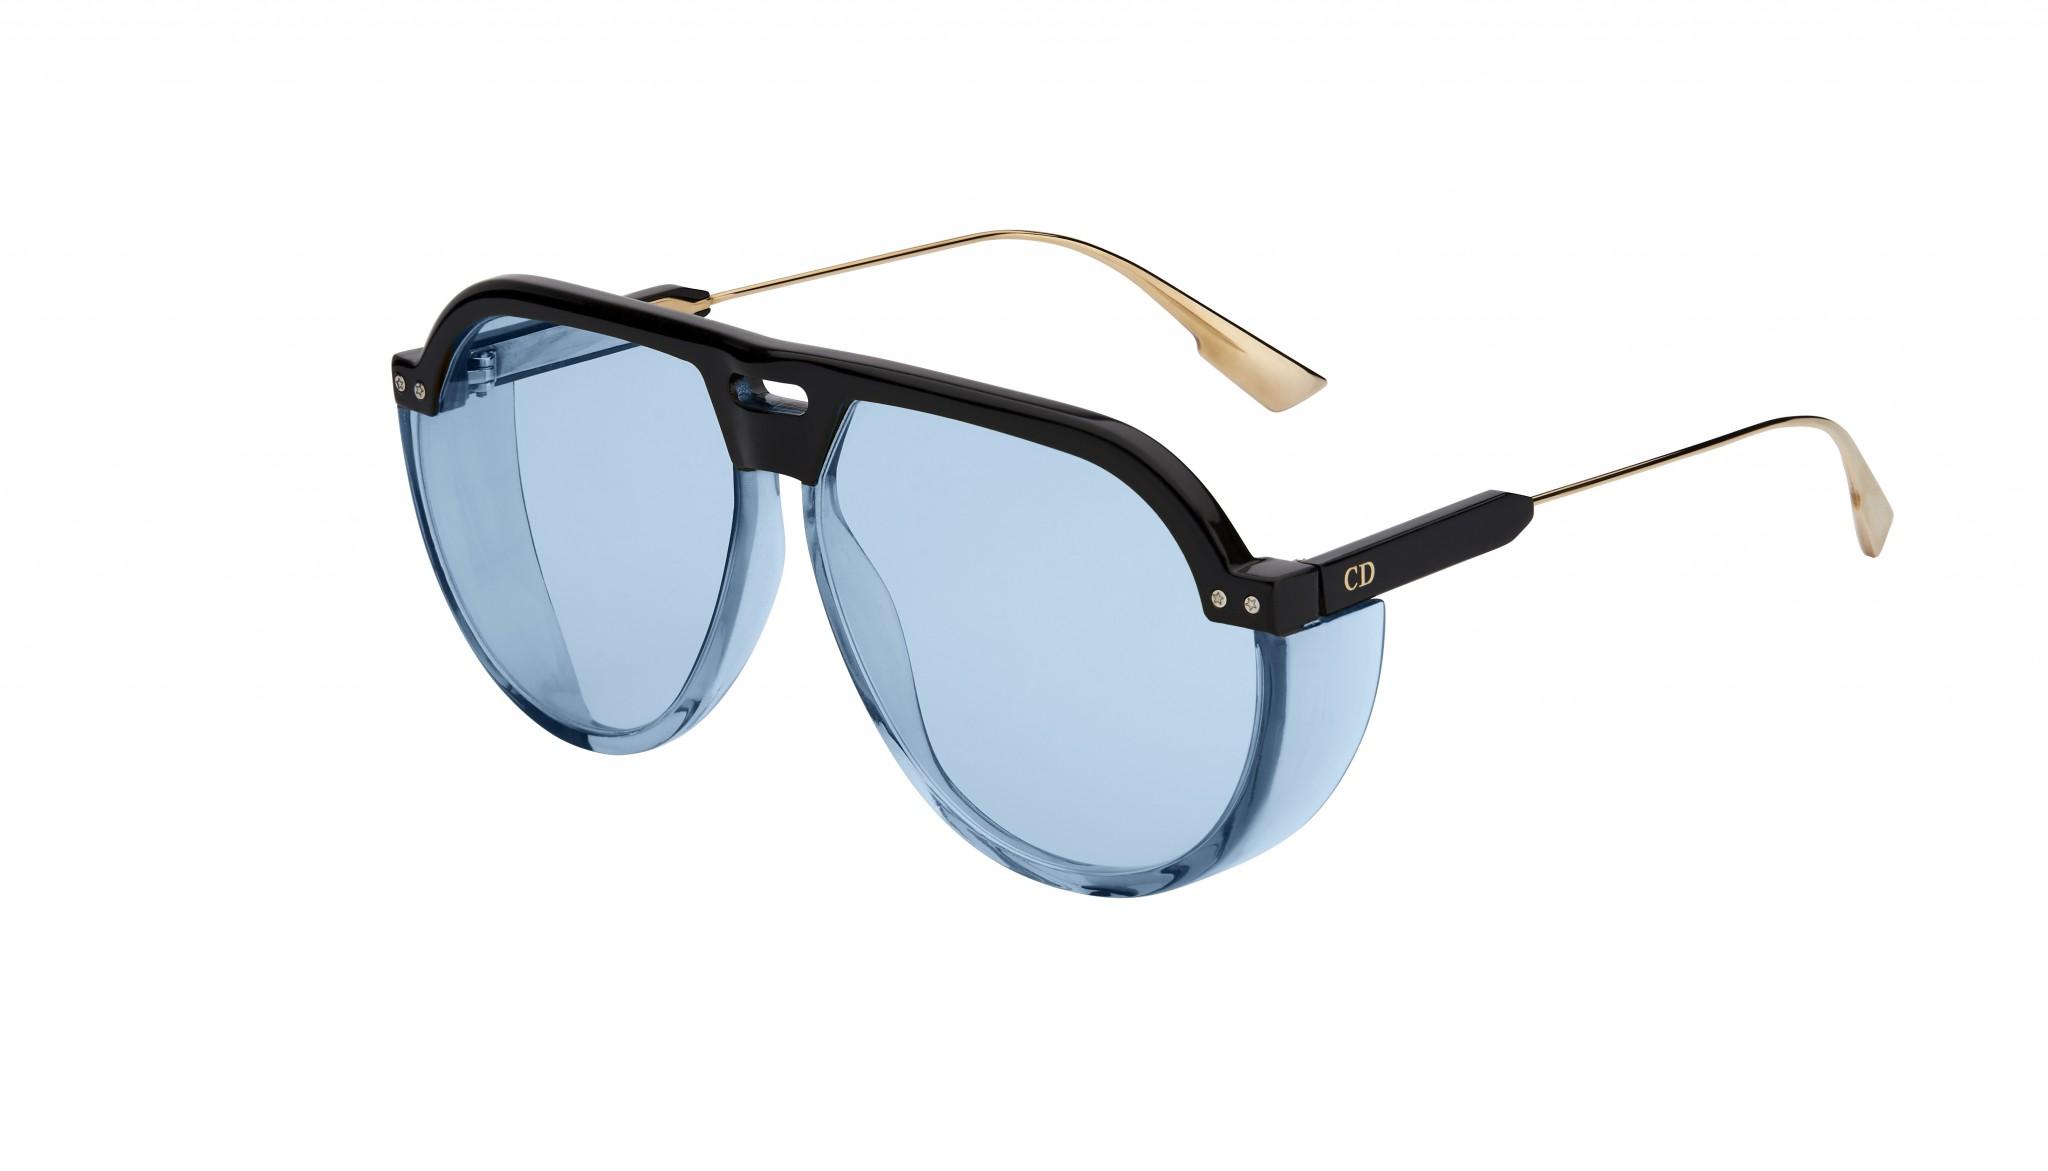 DiorClub3 sunglasses Dior uxQgv